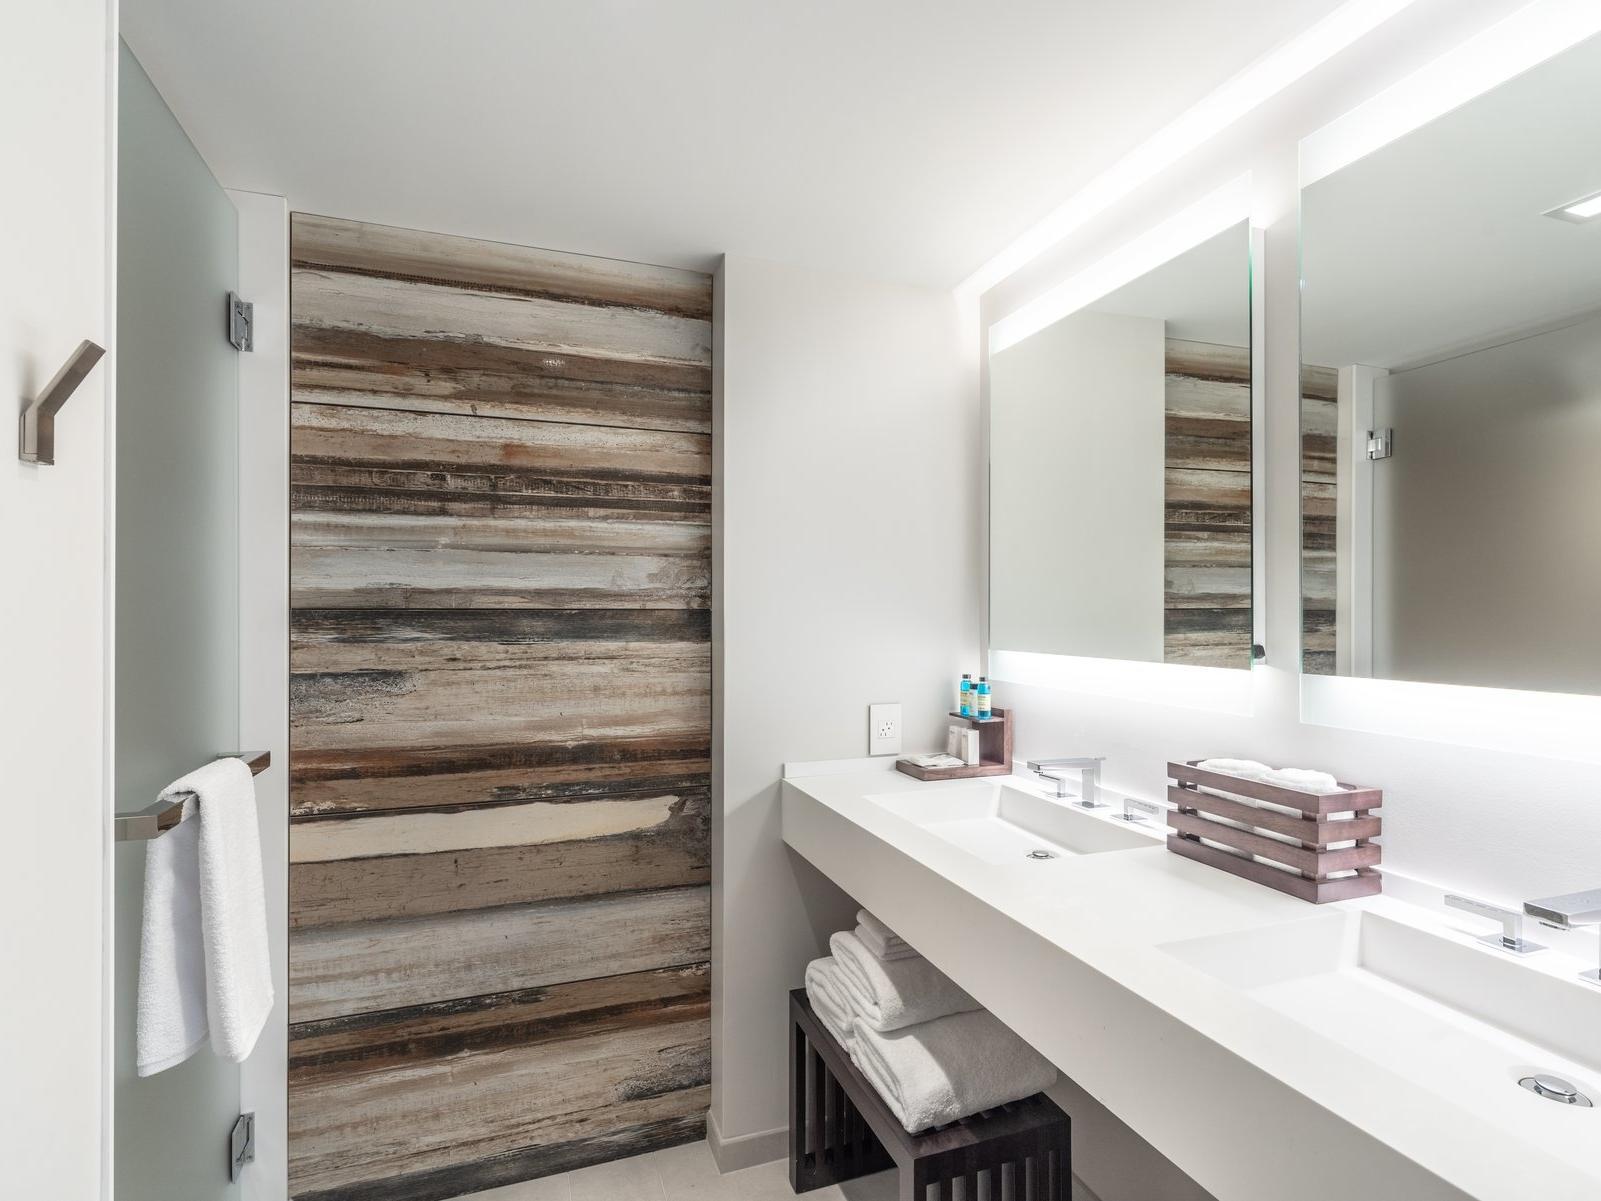 Guest bathroom with double sink vanity